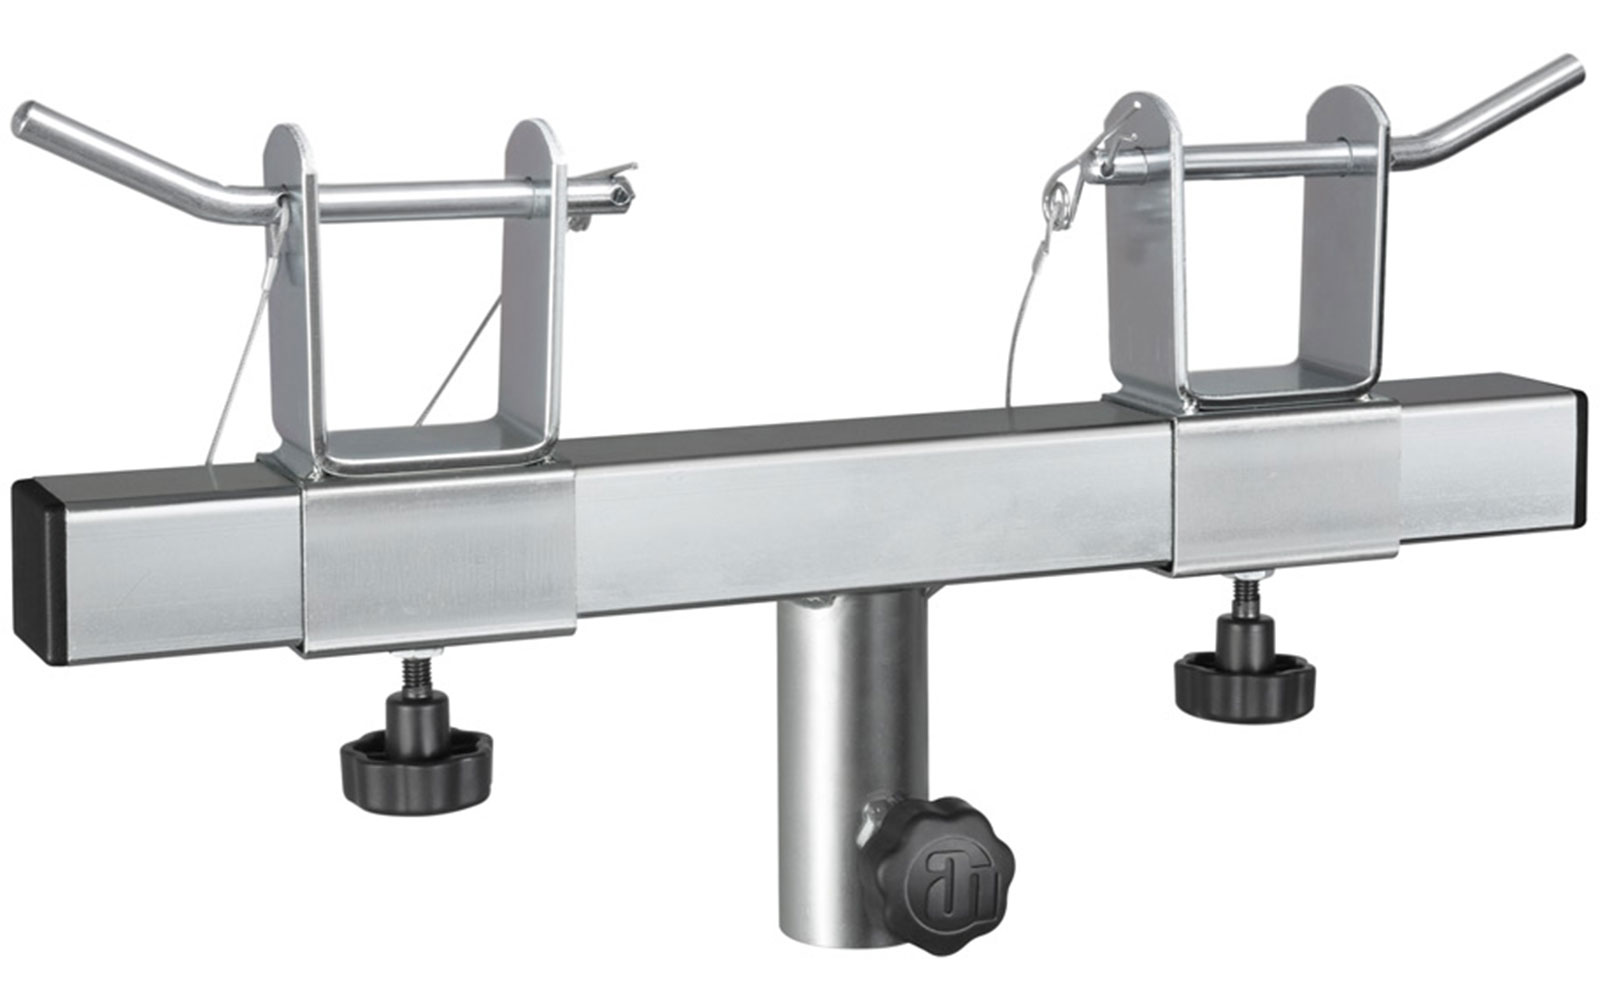 adam-hall-tra-36-truss-adapter-fa-r-35mm-stativaufnahme